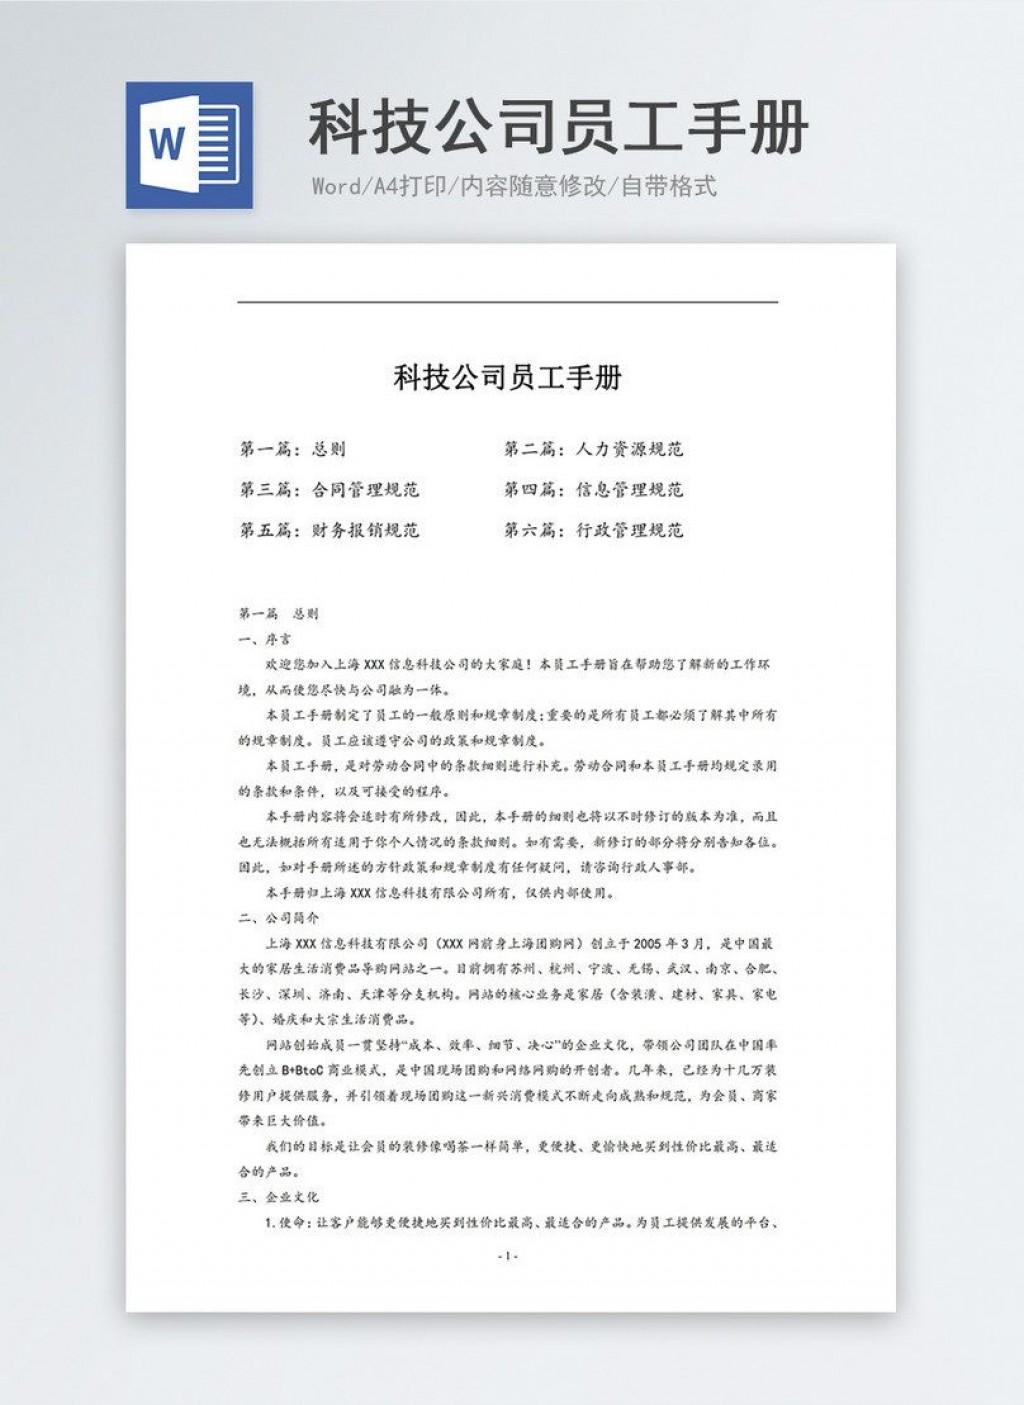 002 Wonderful Free Employee Handbook Template Word Highest Clarity  Sample In Training ManualLarge